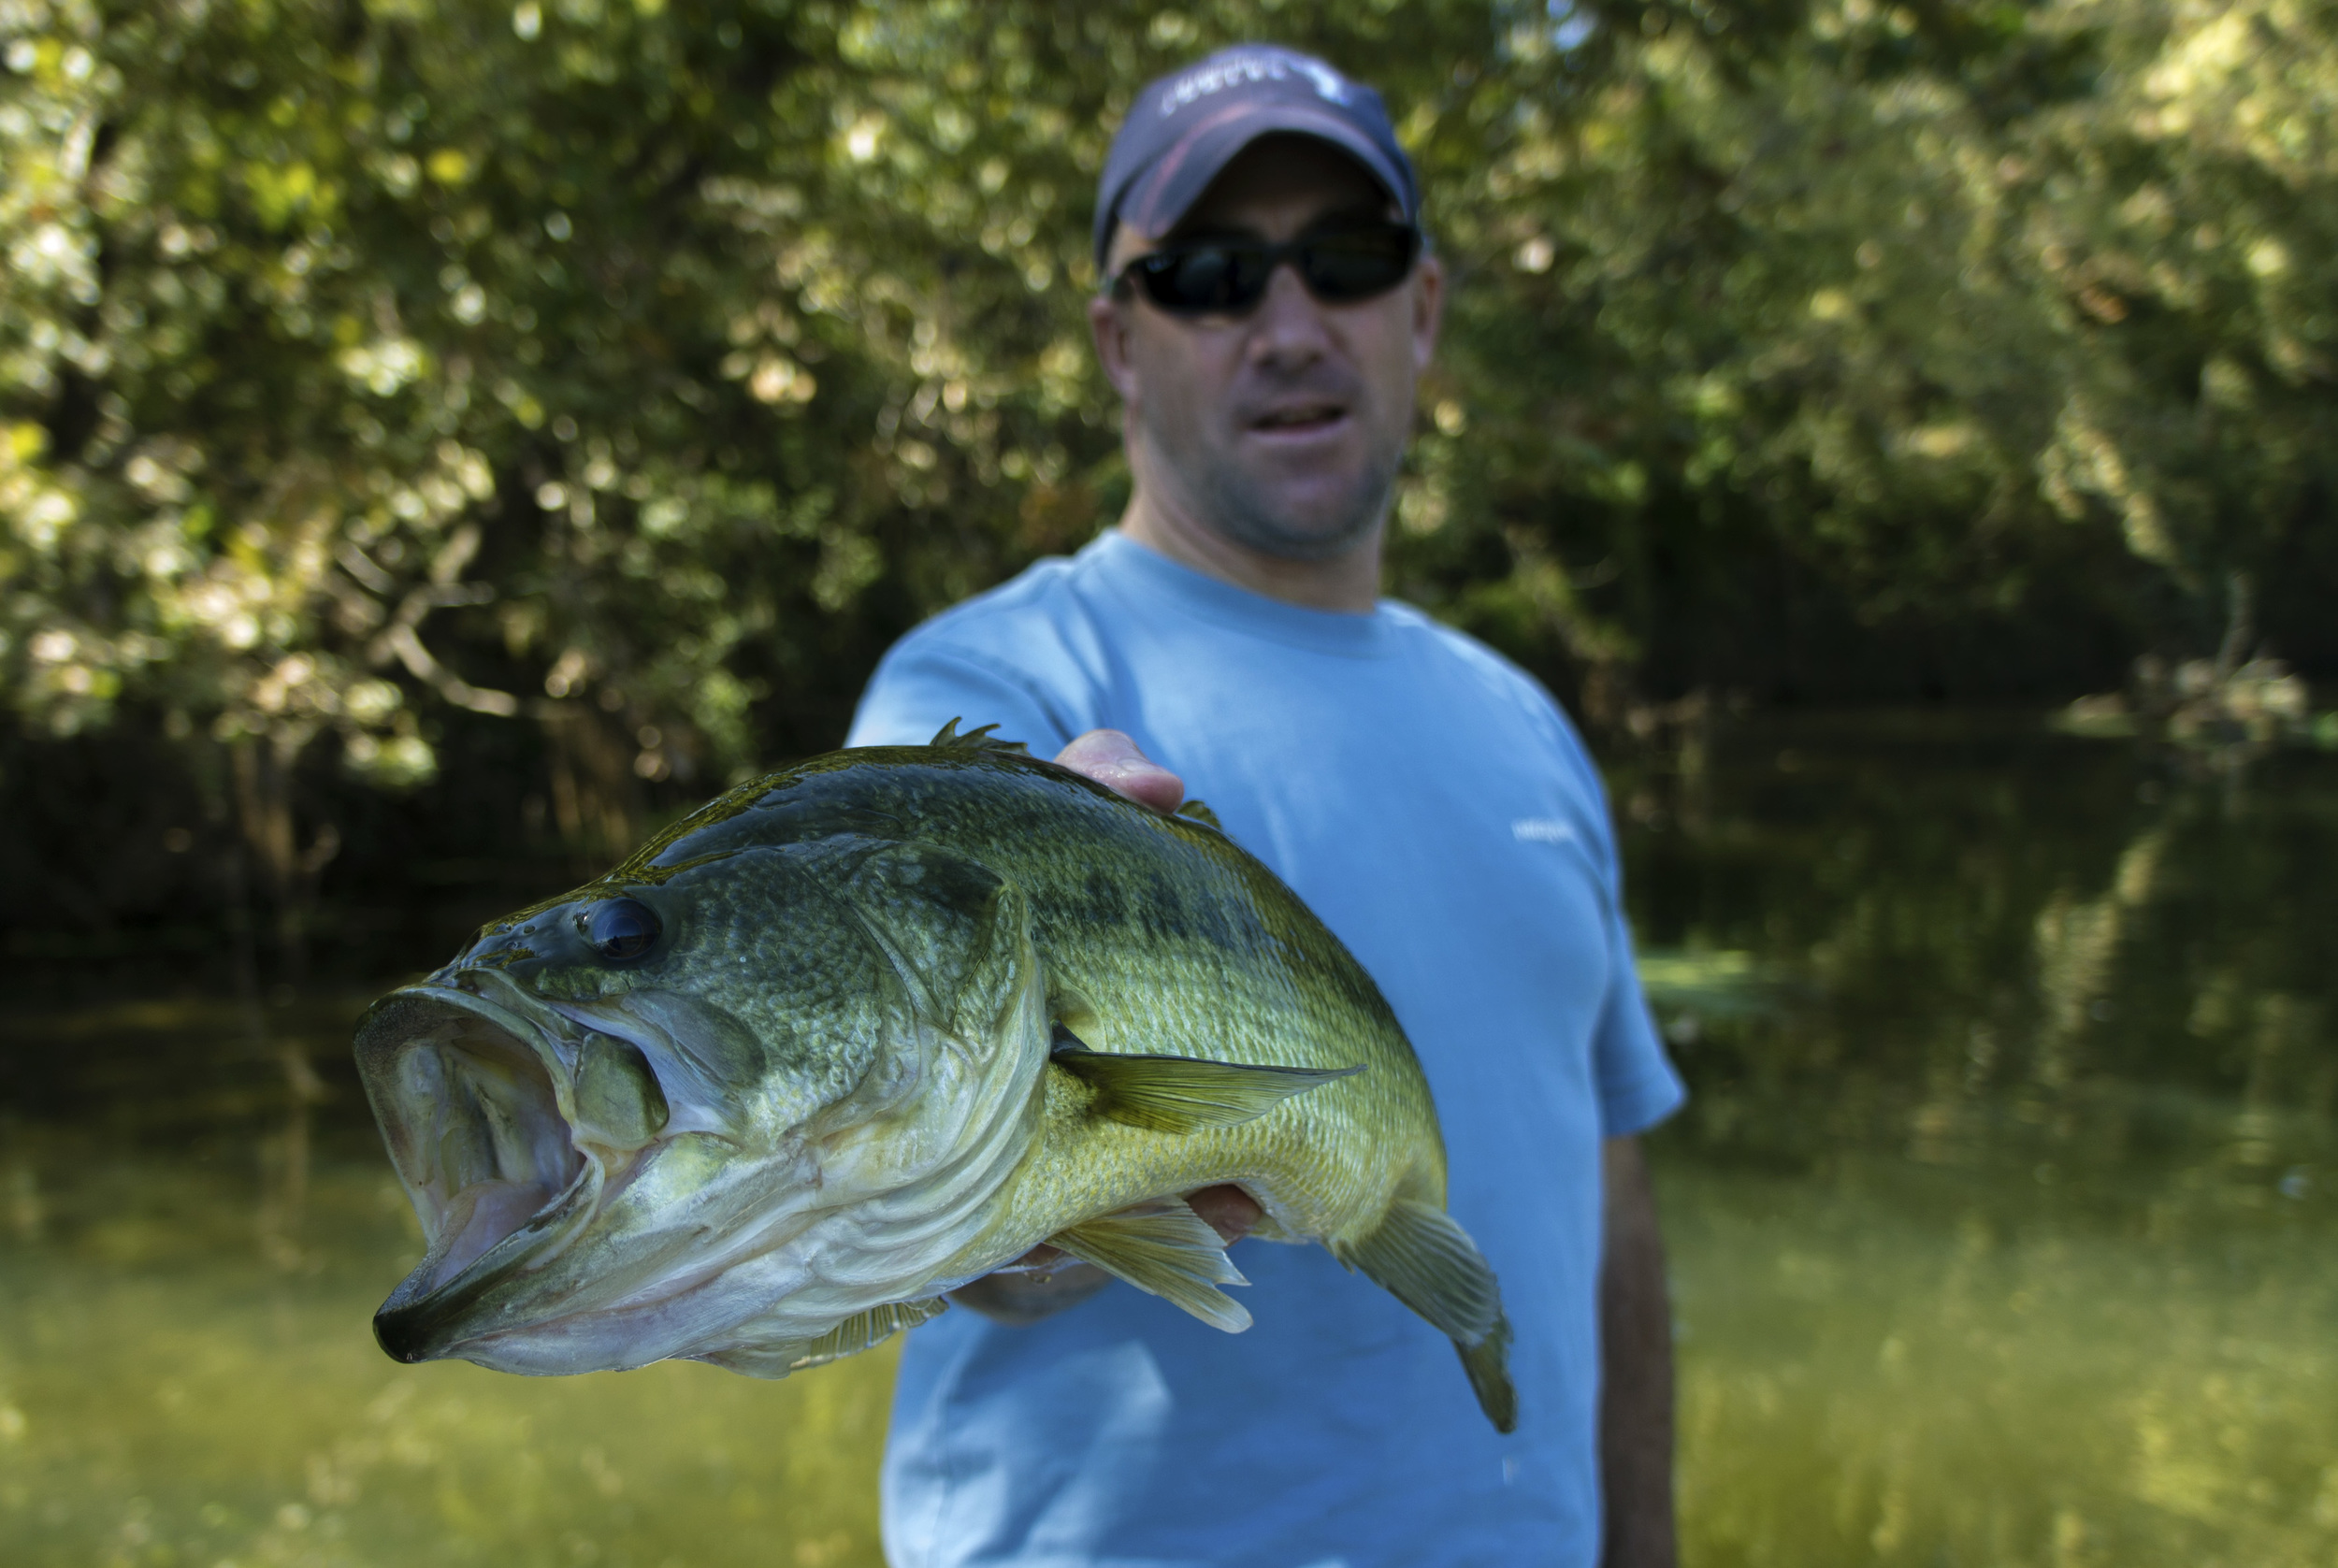 Winston with a Colorado River bass